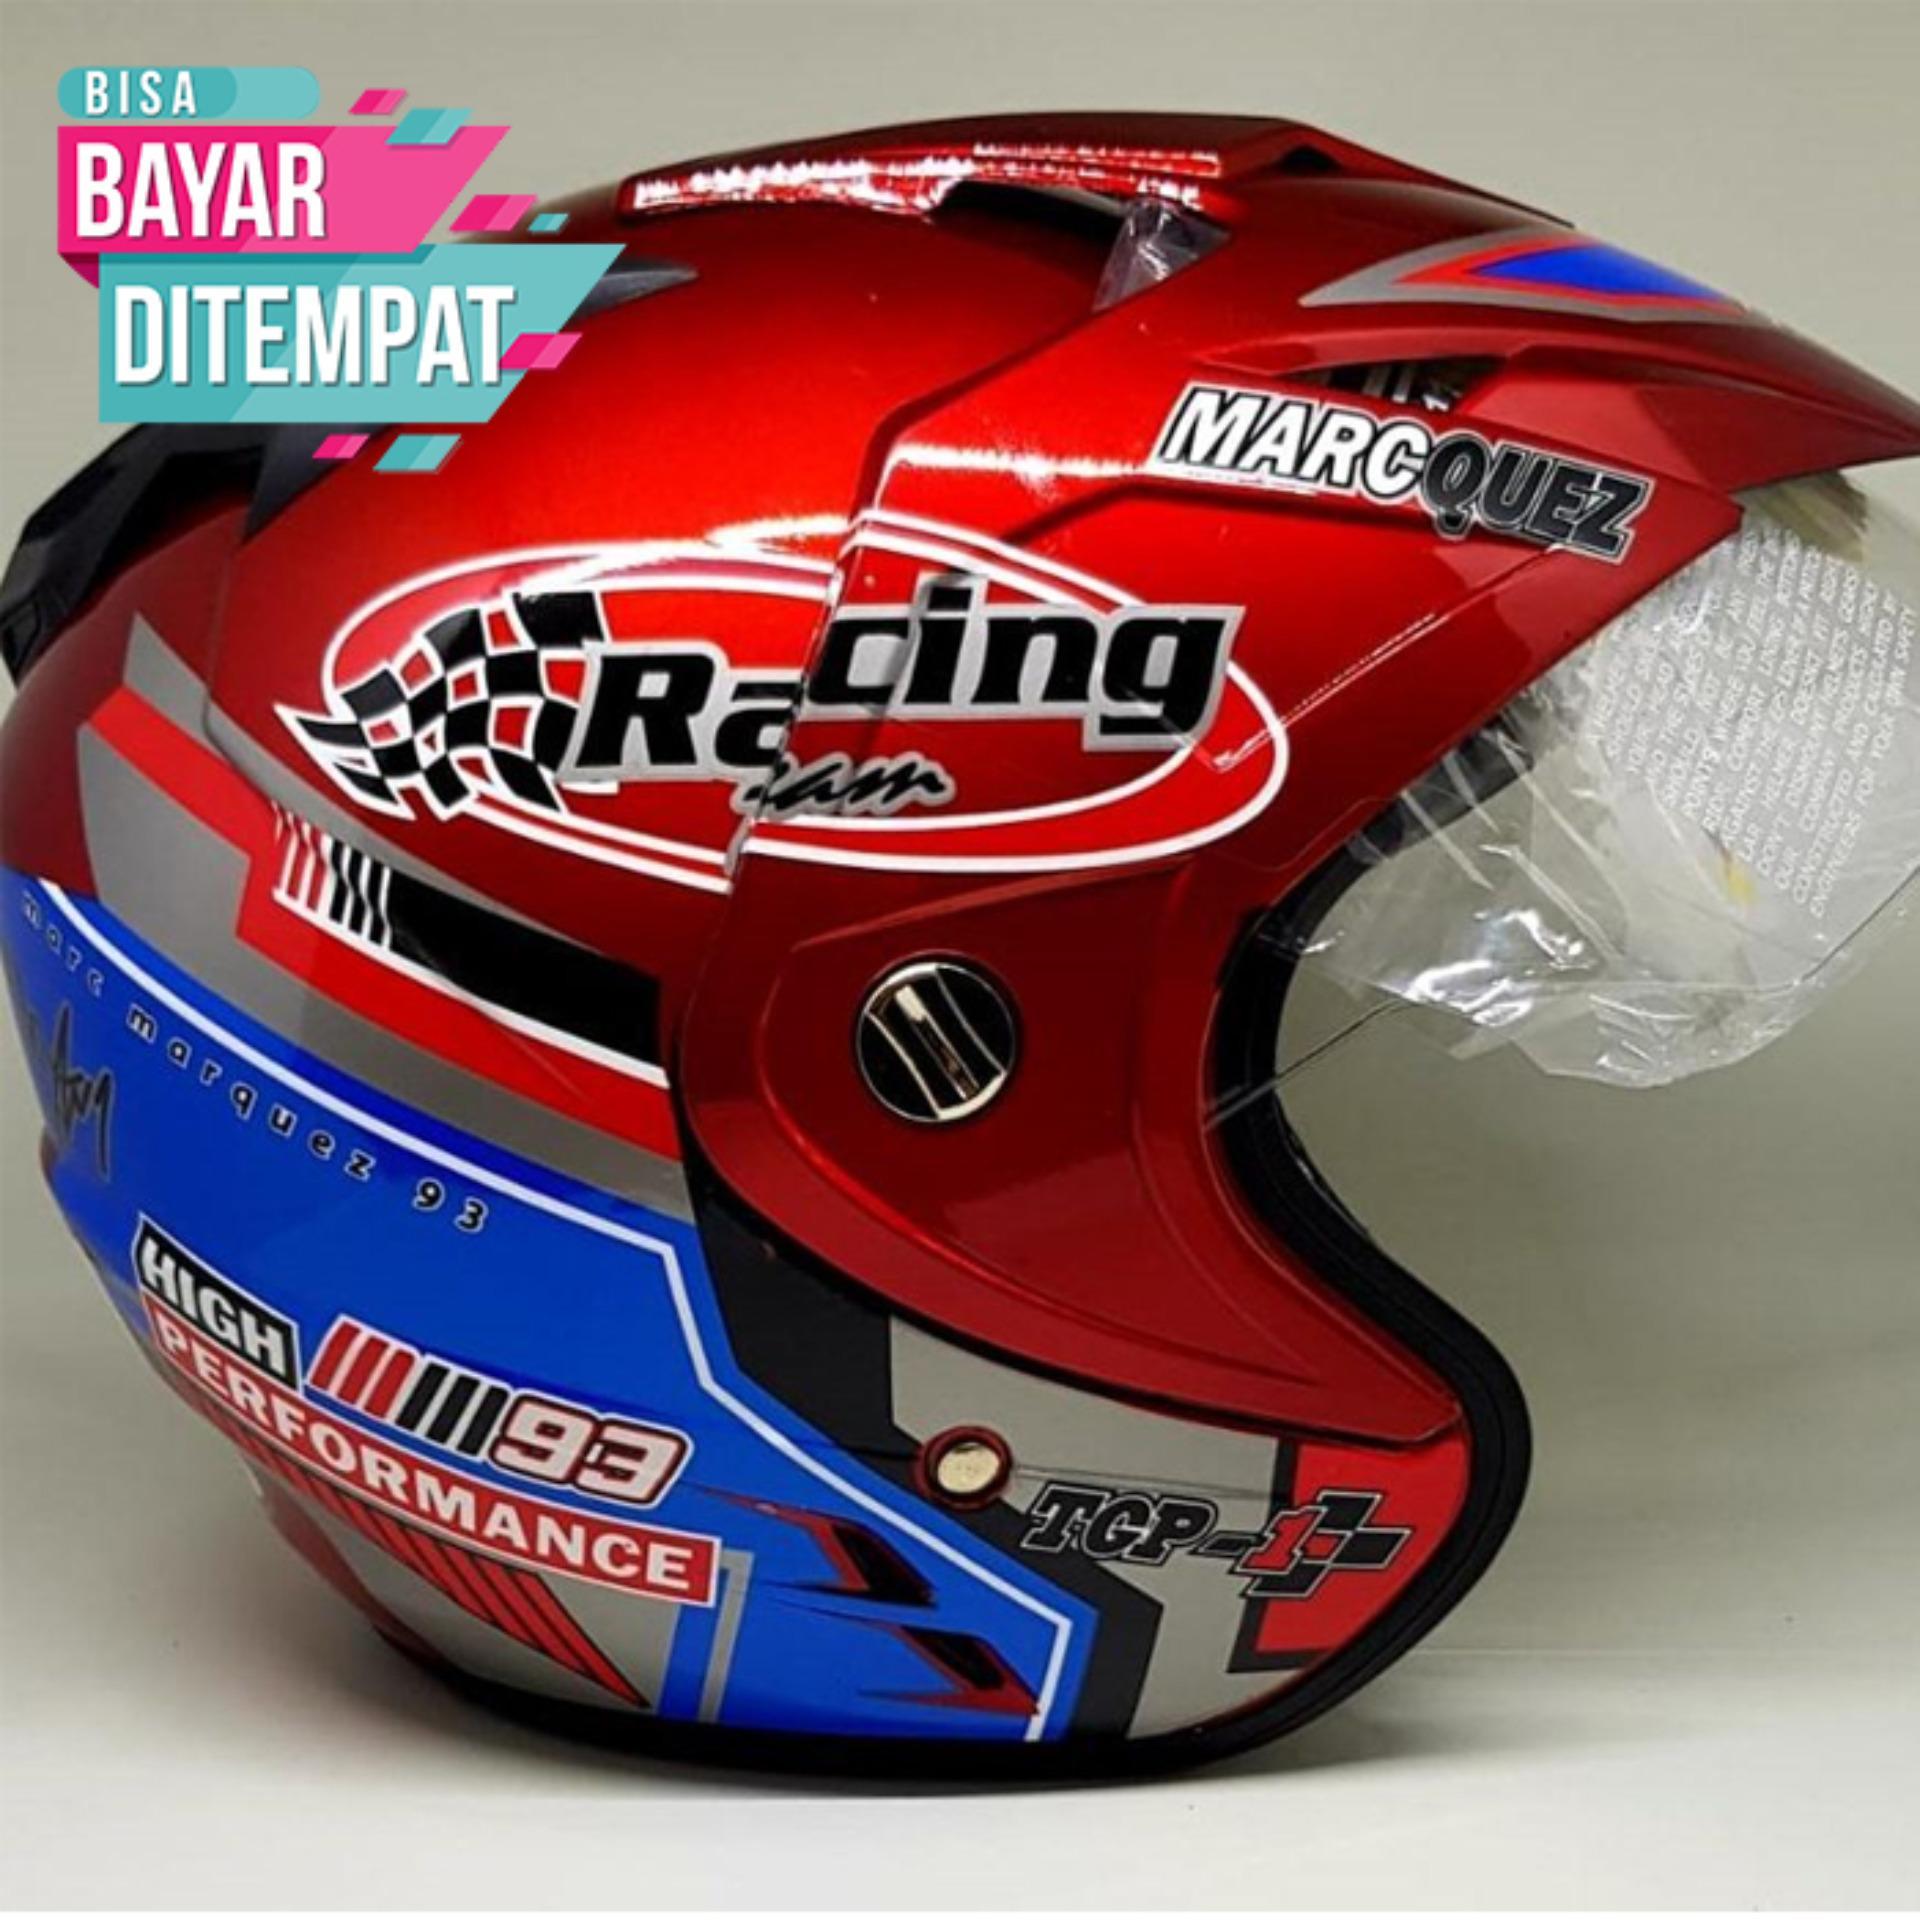 [Promo Best Seller] Helmet Dewasa Double Visor SNI Motoif Marc Marquez 93 Warna Merah Kualitas Setara Helm KYT INK GM WTO MSR BMC NHK